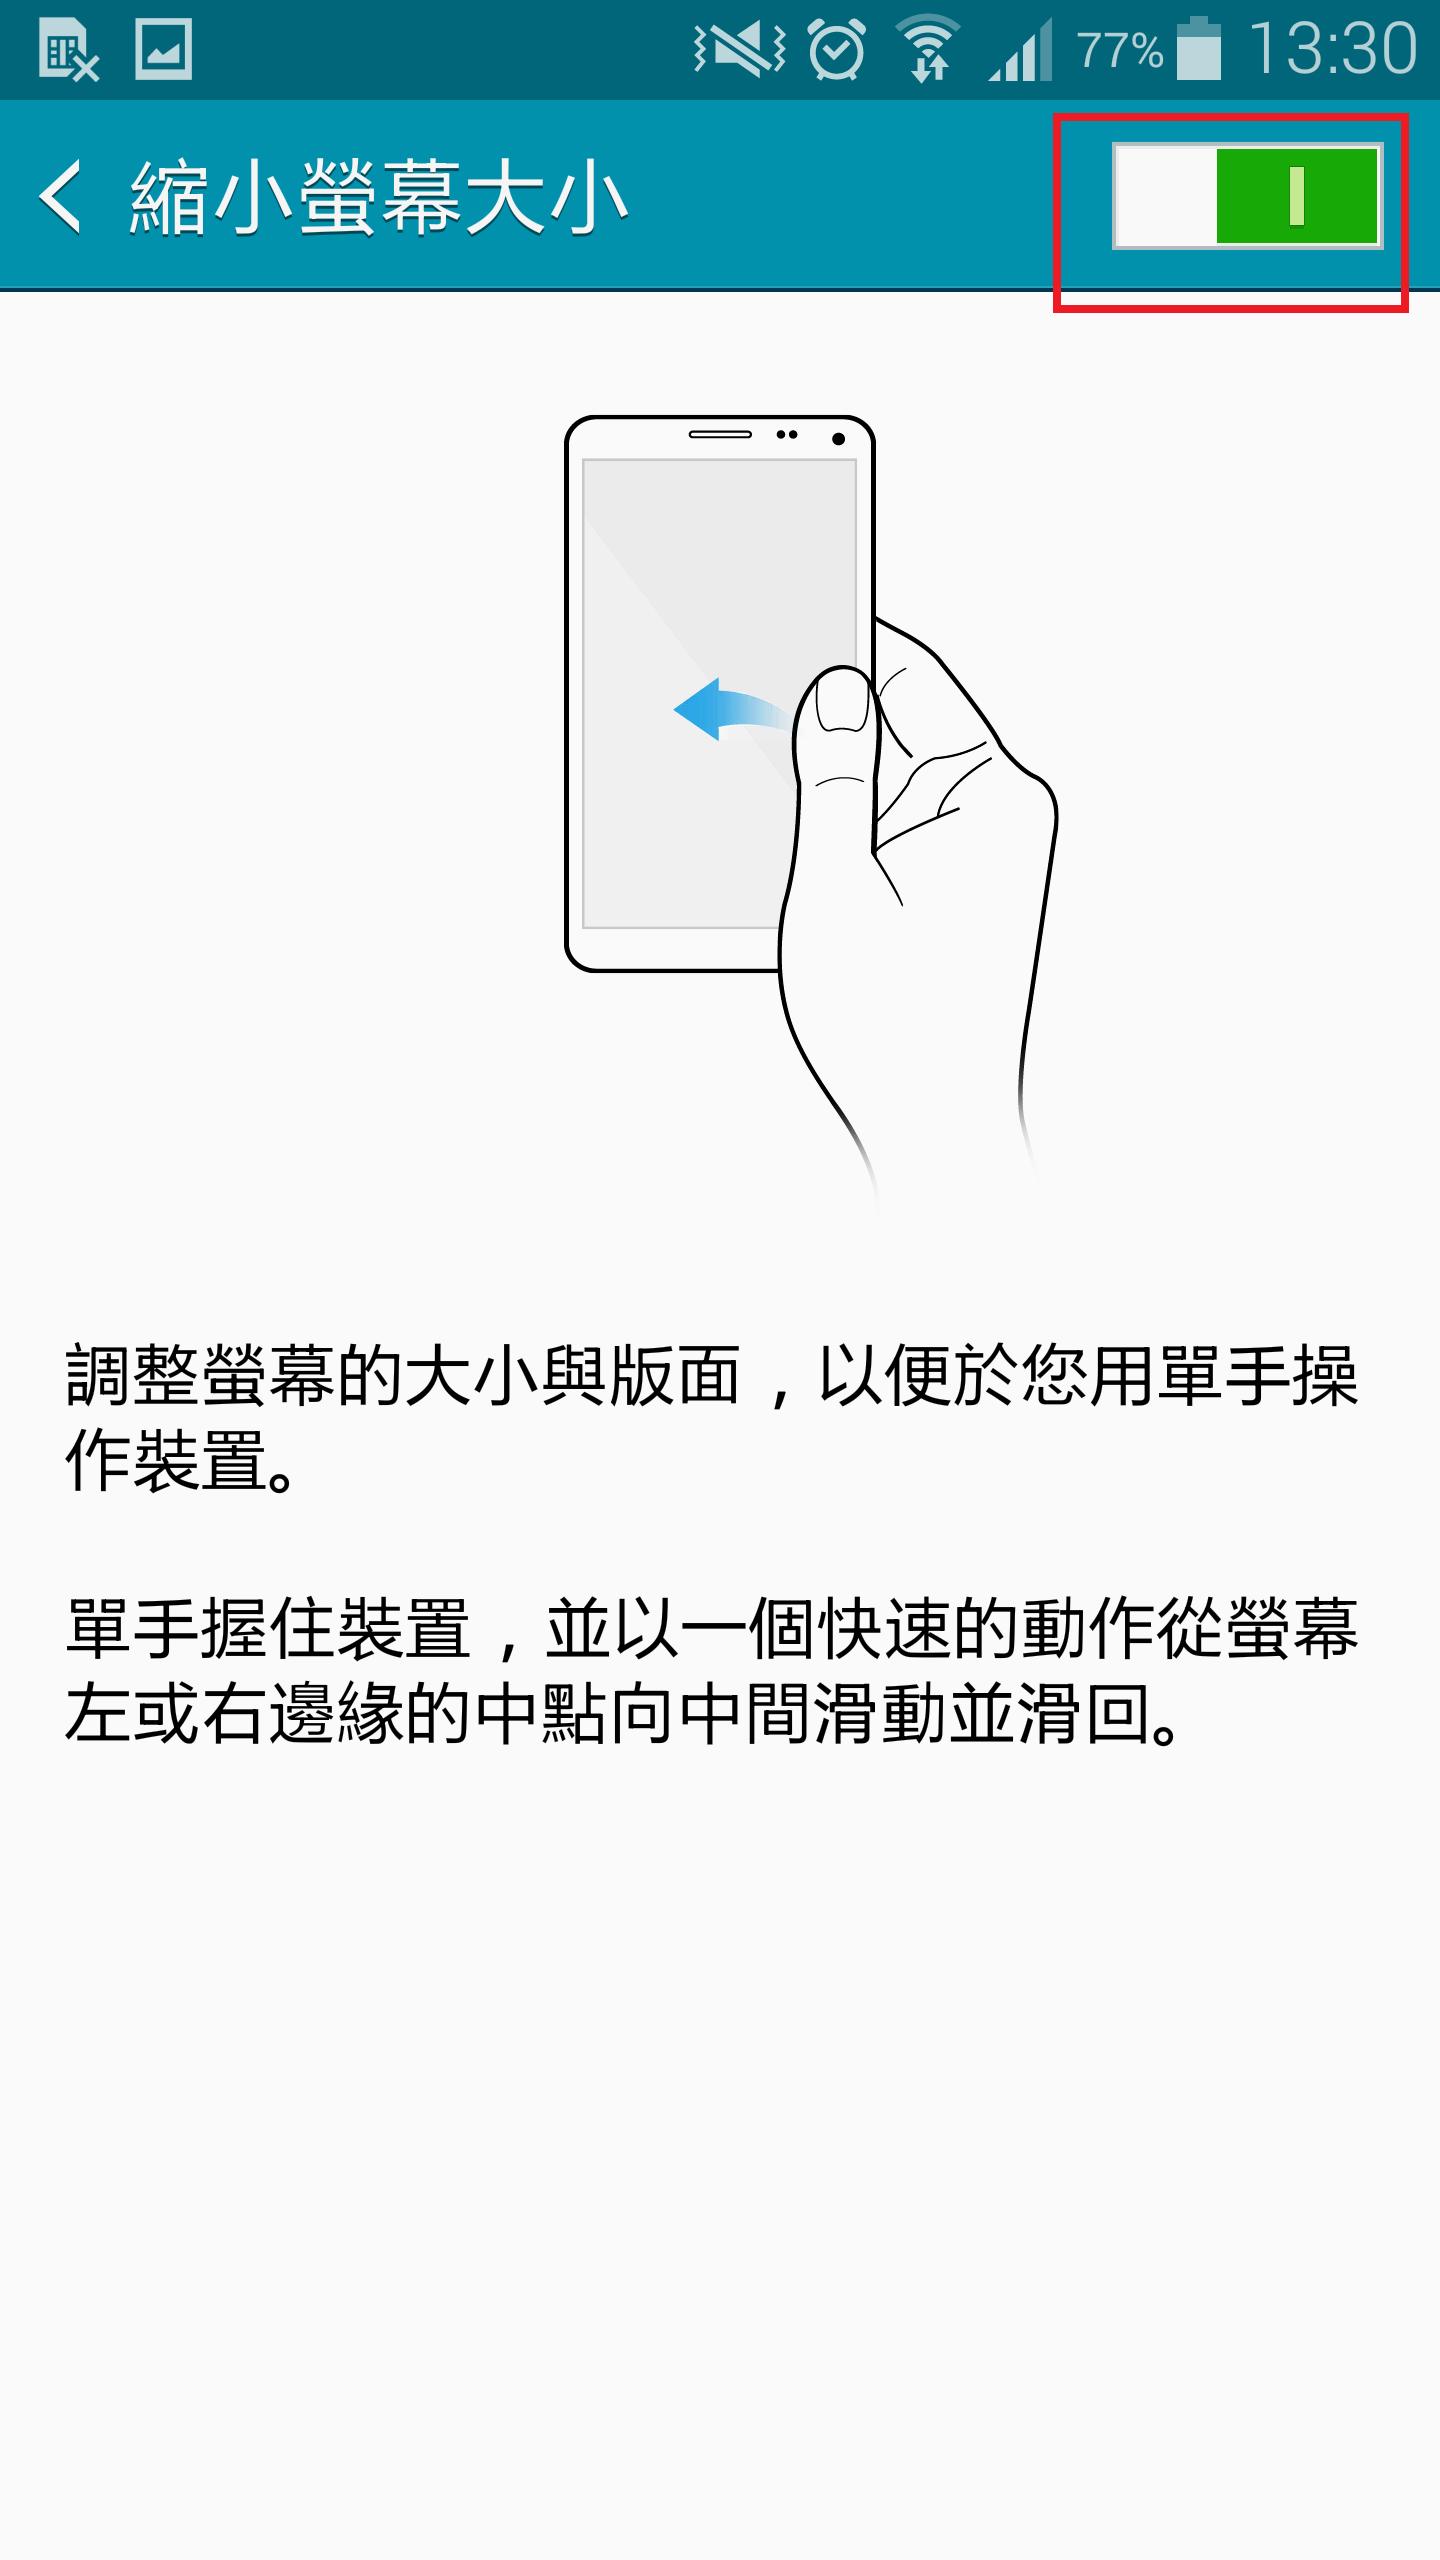 Galaxy Note4 如何使用單手操作?